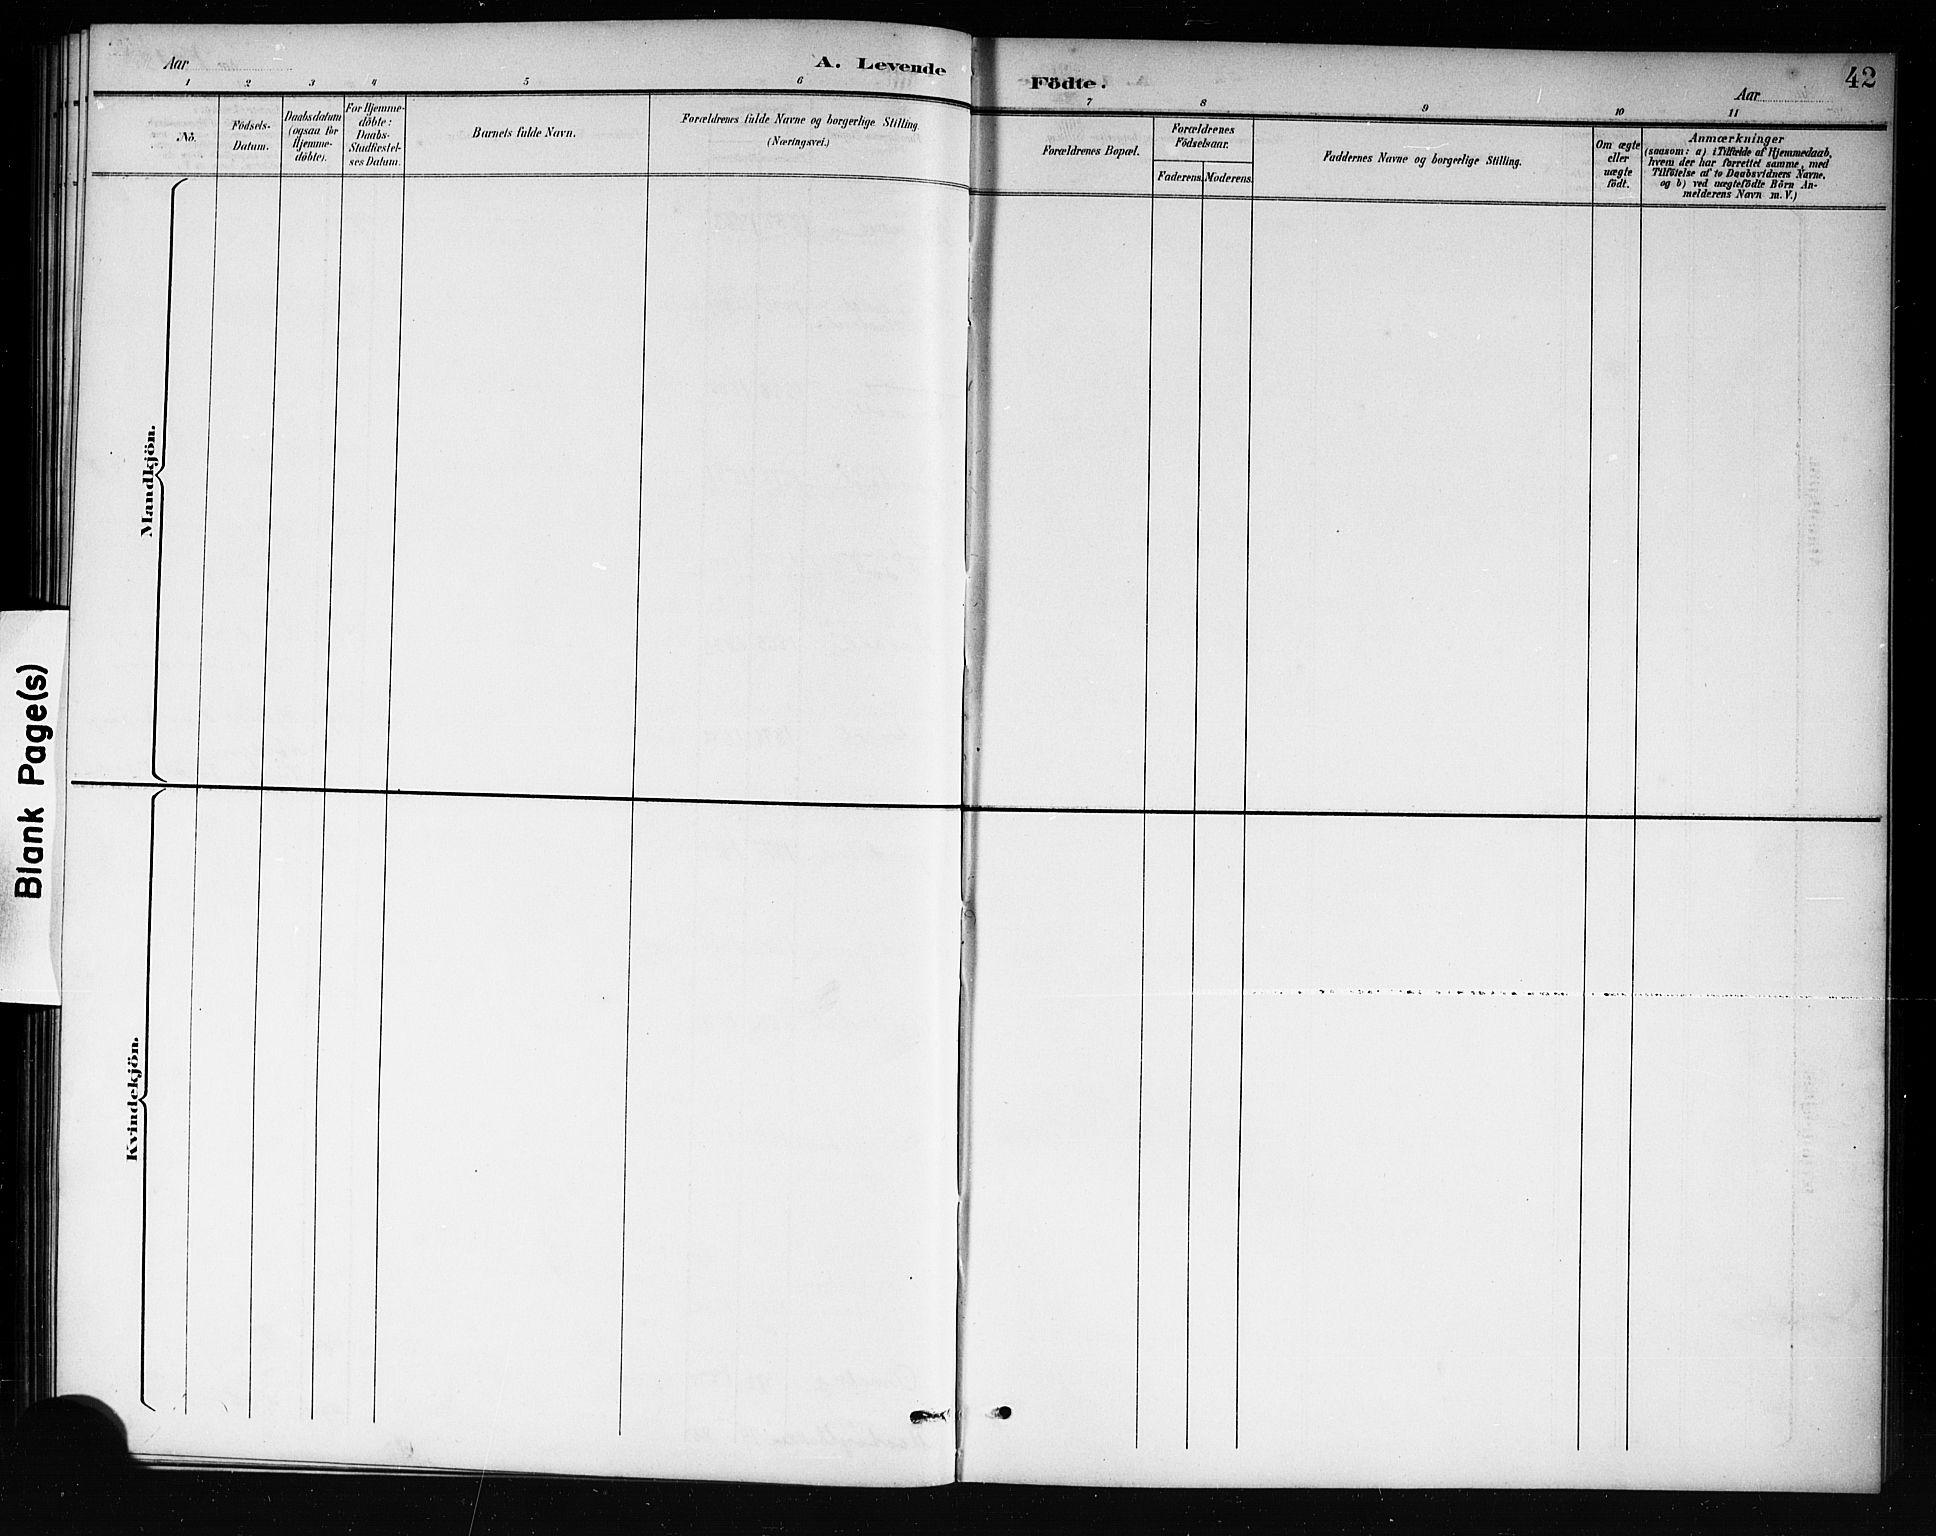 SAKO, Mo kirkebøker, G/Ga/L0002: Klokkerbok nr. I 2, 1892-1914, s. 42